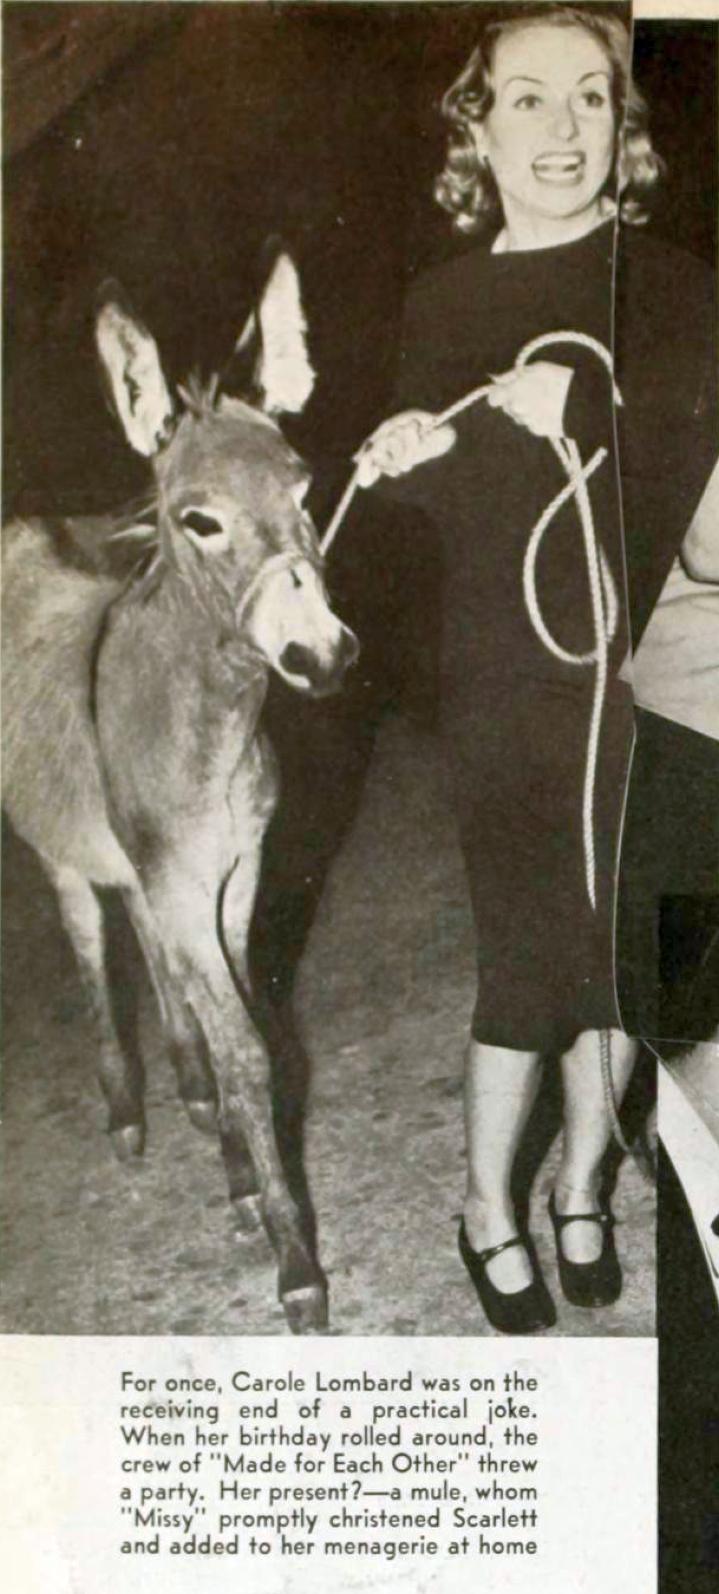 carole lombard photoplay jan 1939 cal york gossip of hollywood 00a